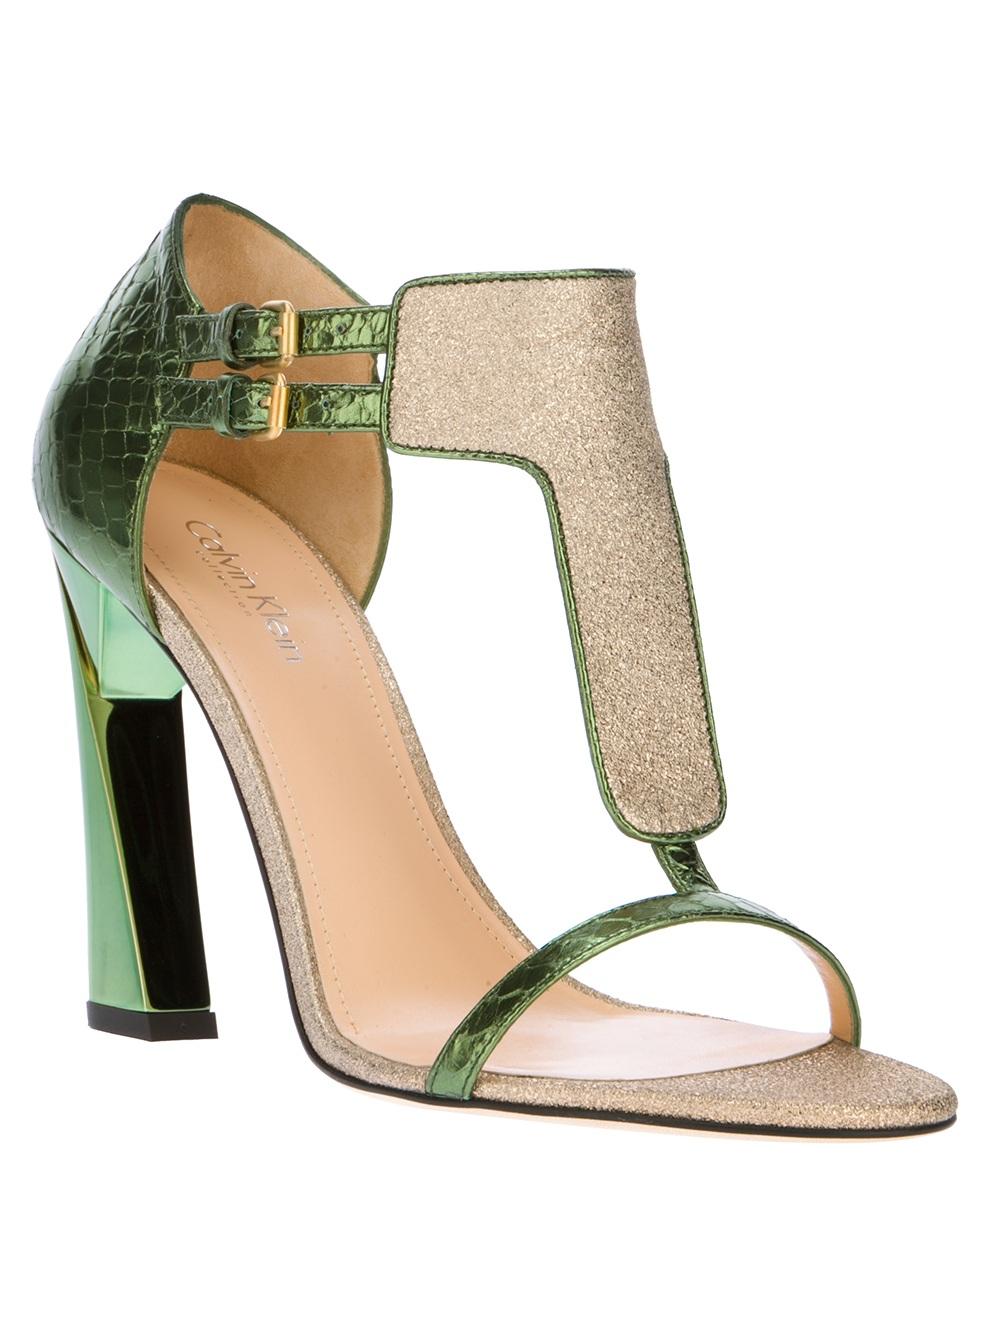 Calvin Klein Highheeled Sandal In Green Lyst